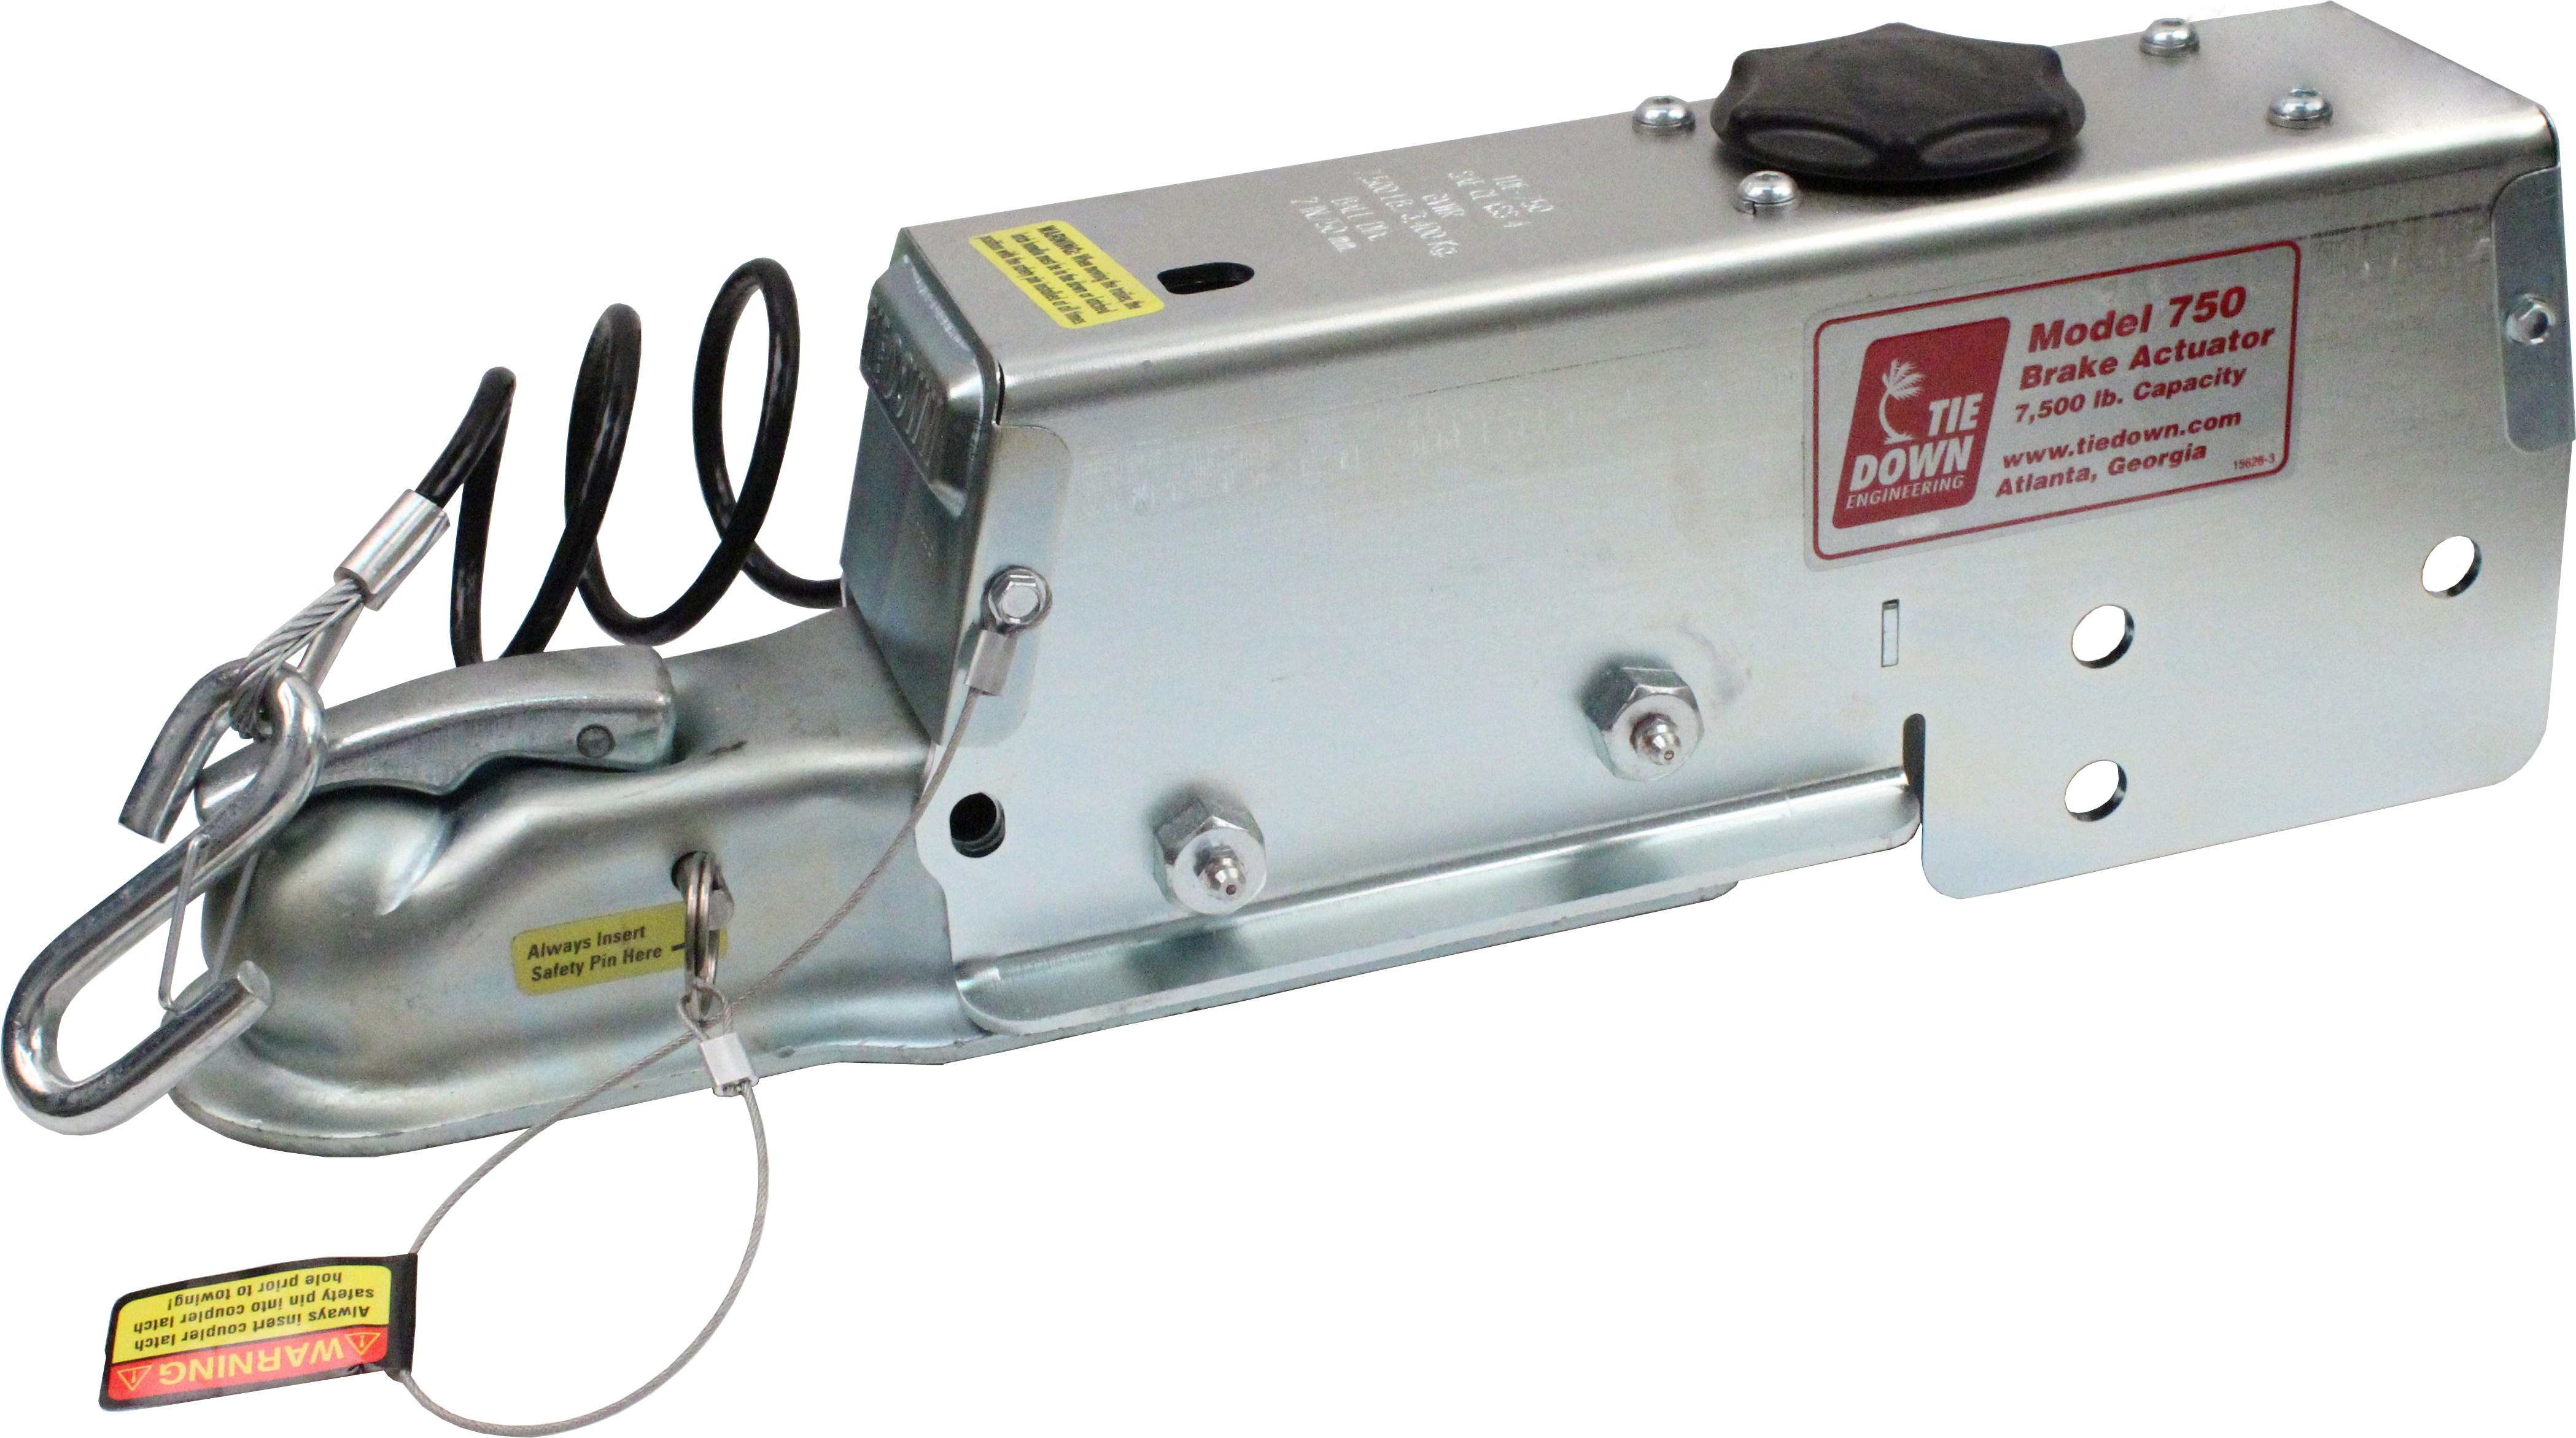 part #, hydraulic brake actuators